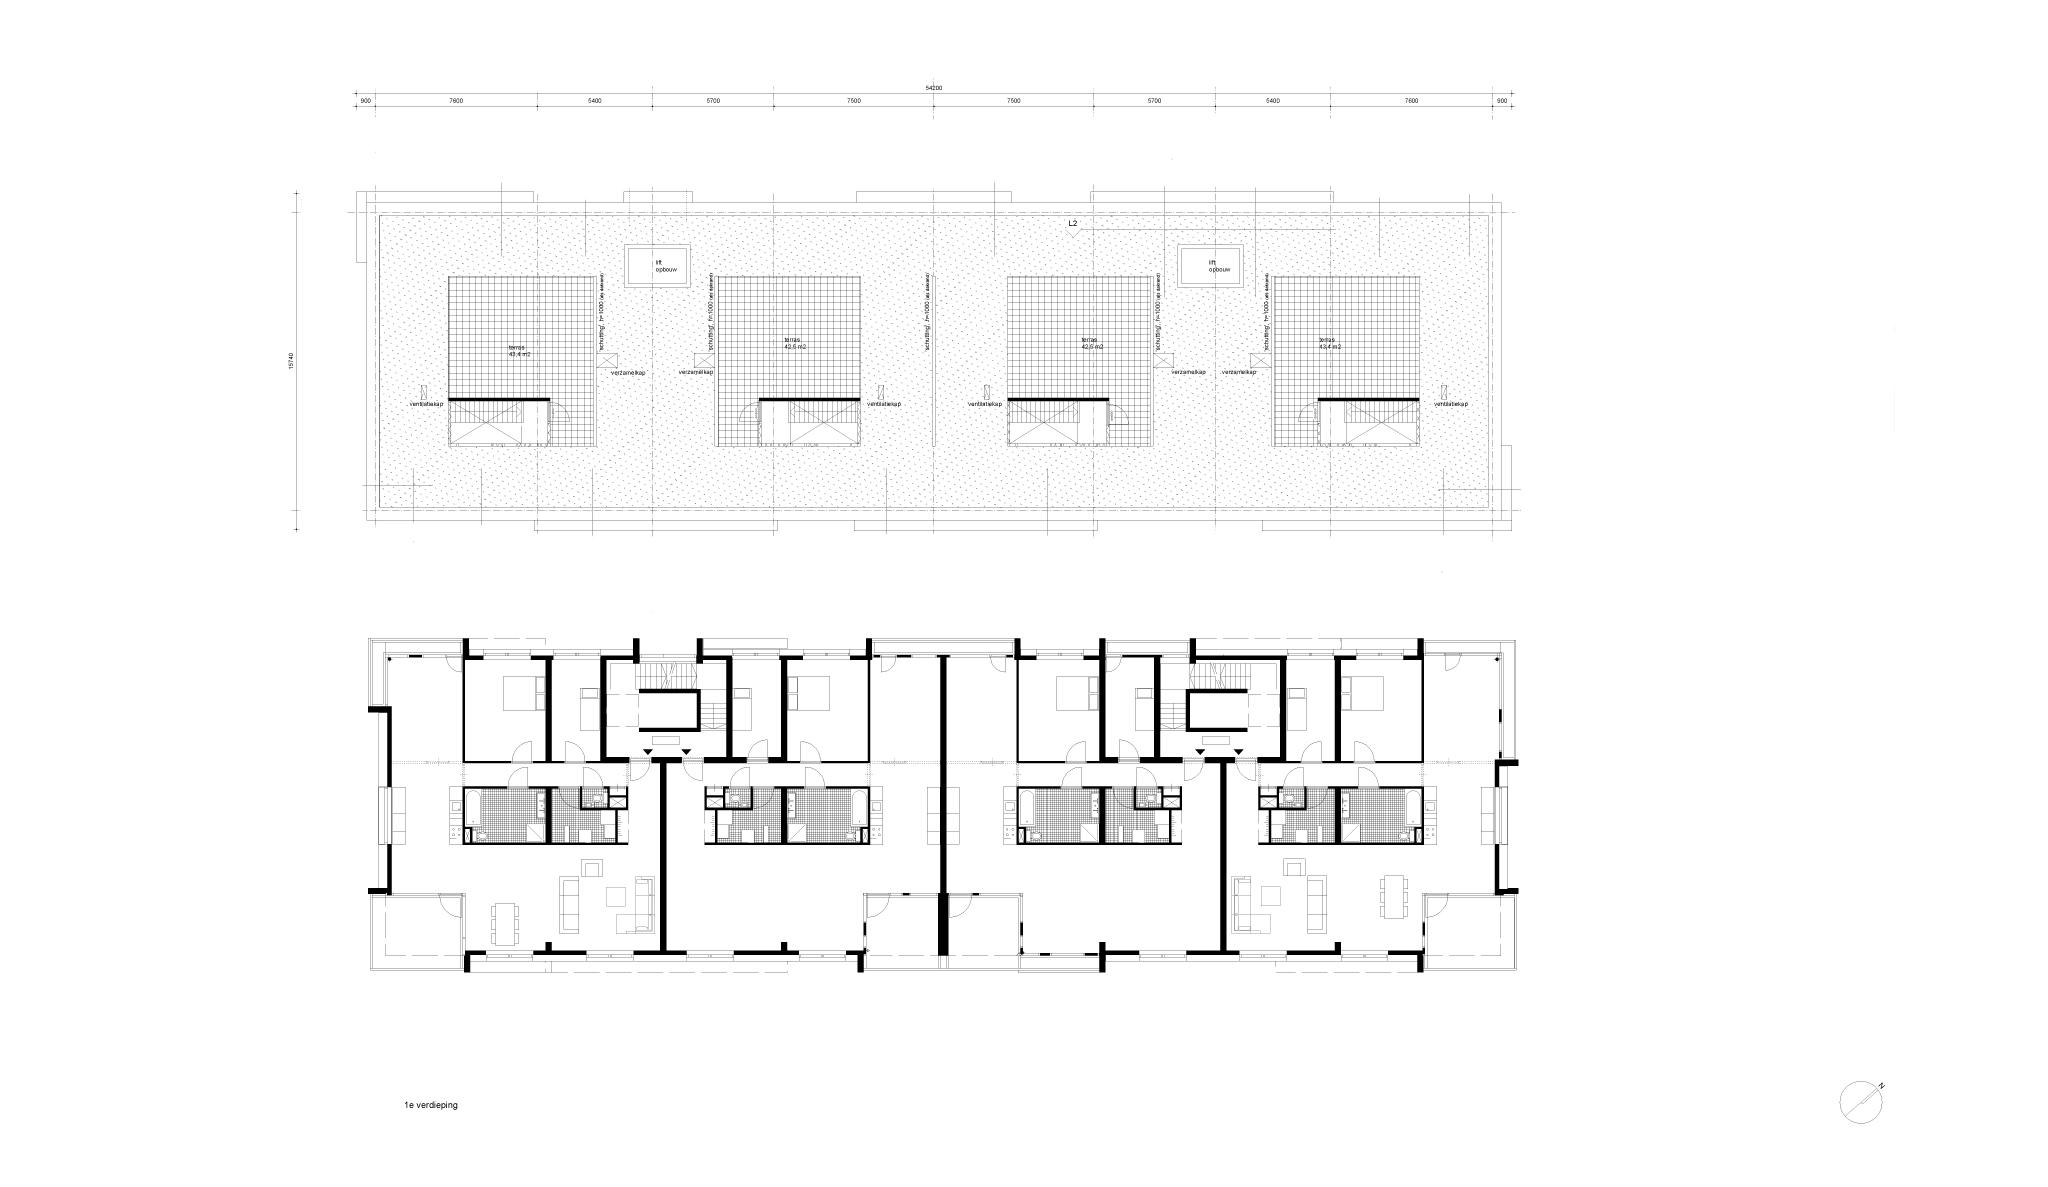 Simone Drost Architecture Planet Pab Architecture Appartementen Stadhouderspark Vught plattegronden